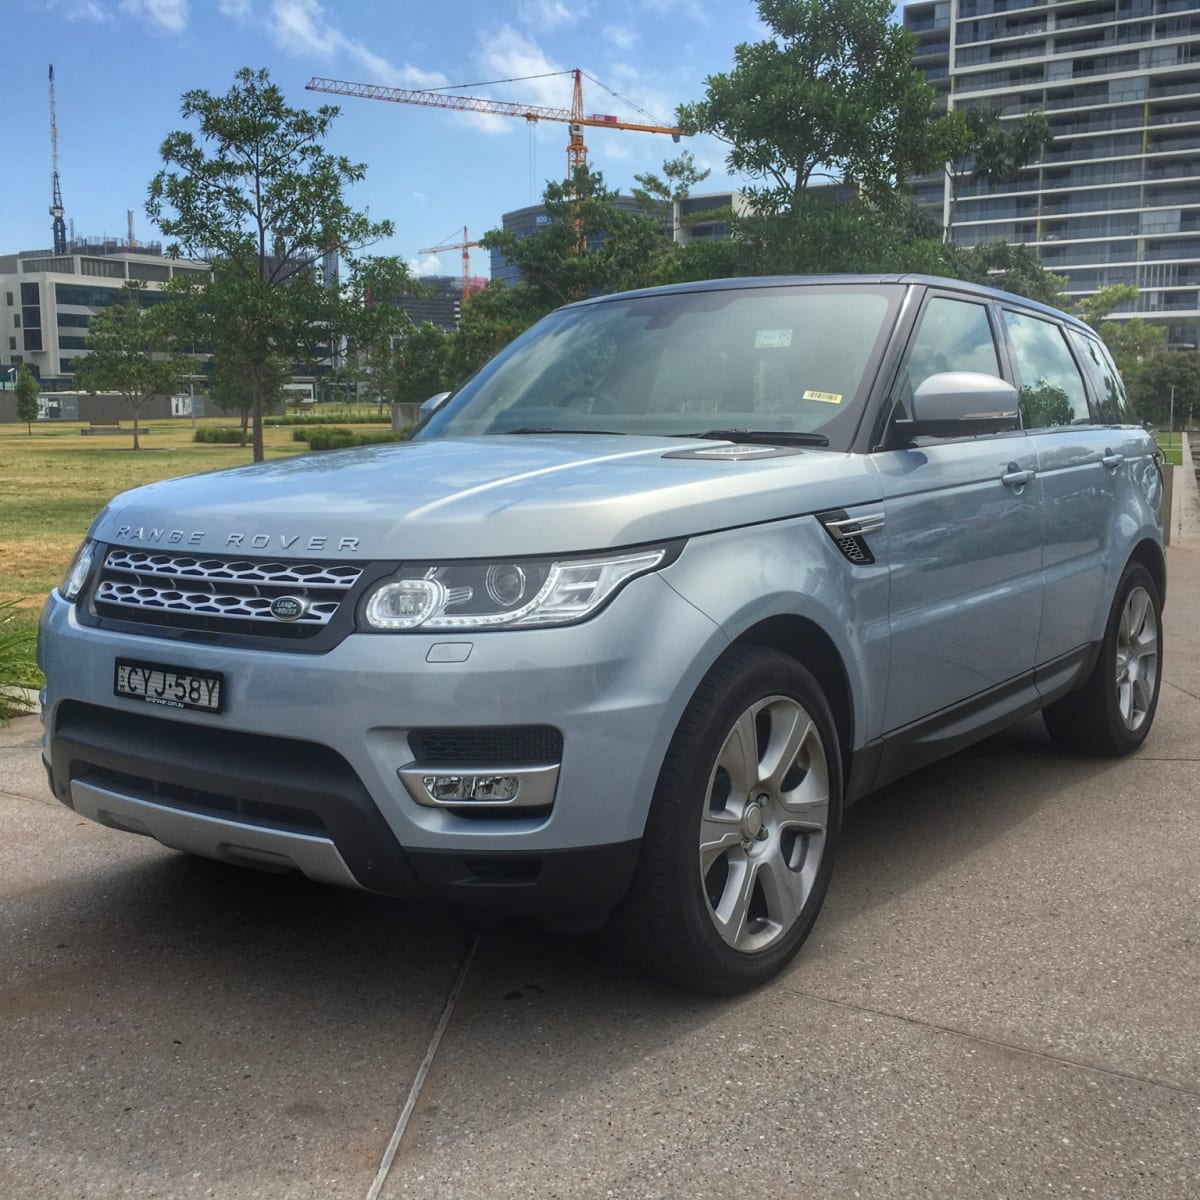 2016 Range Rover Sport Hybrid Review   CarAdvice